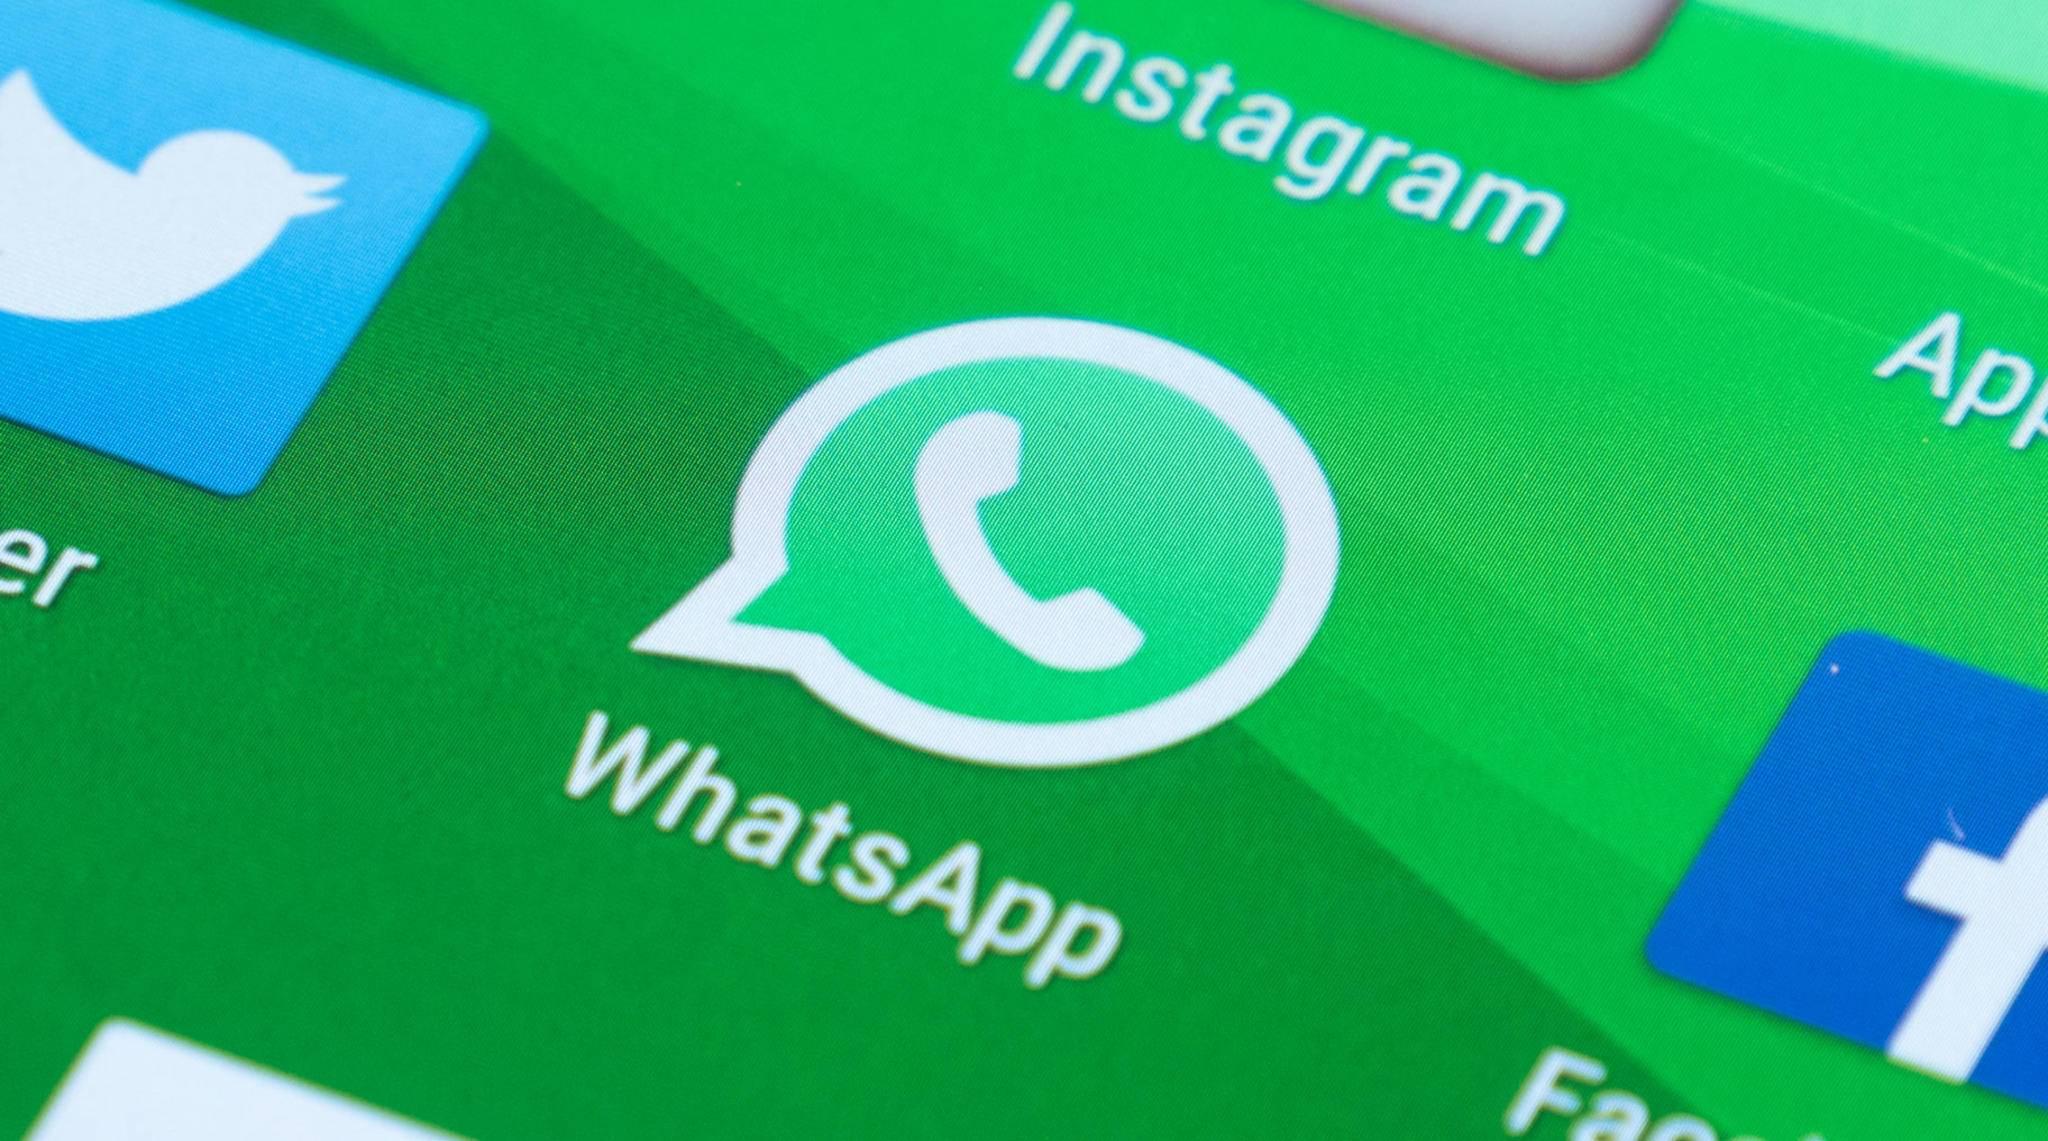 WhatsApp-News - Alles zum Messenger bei TURN ON - cover